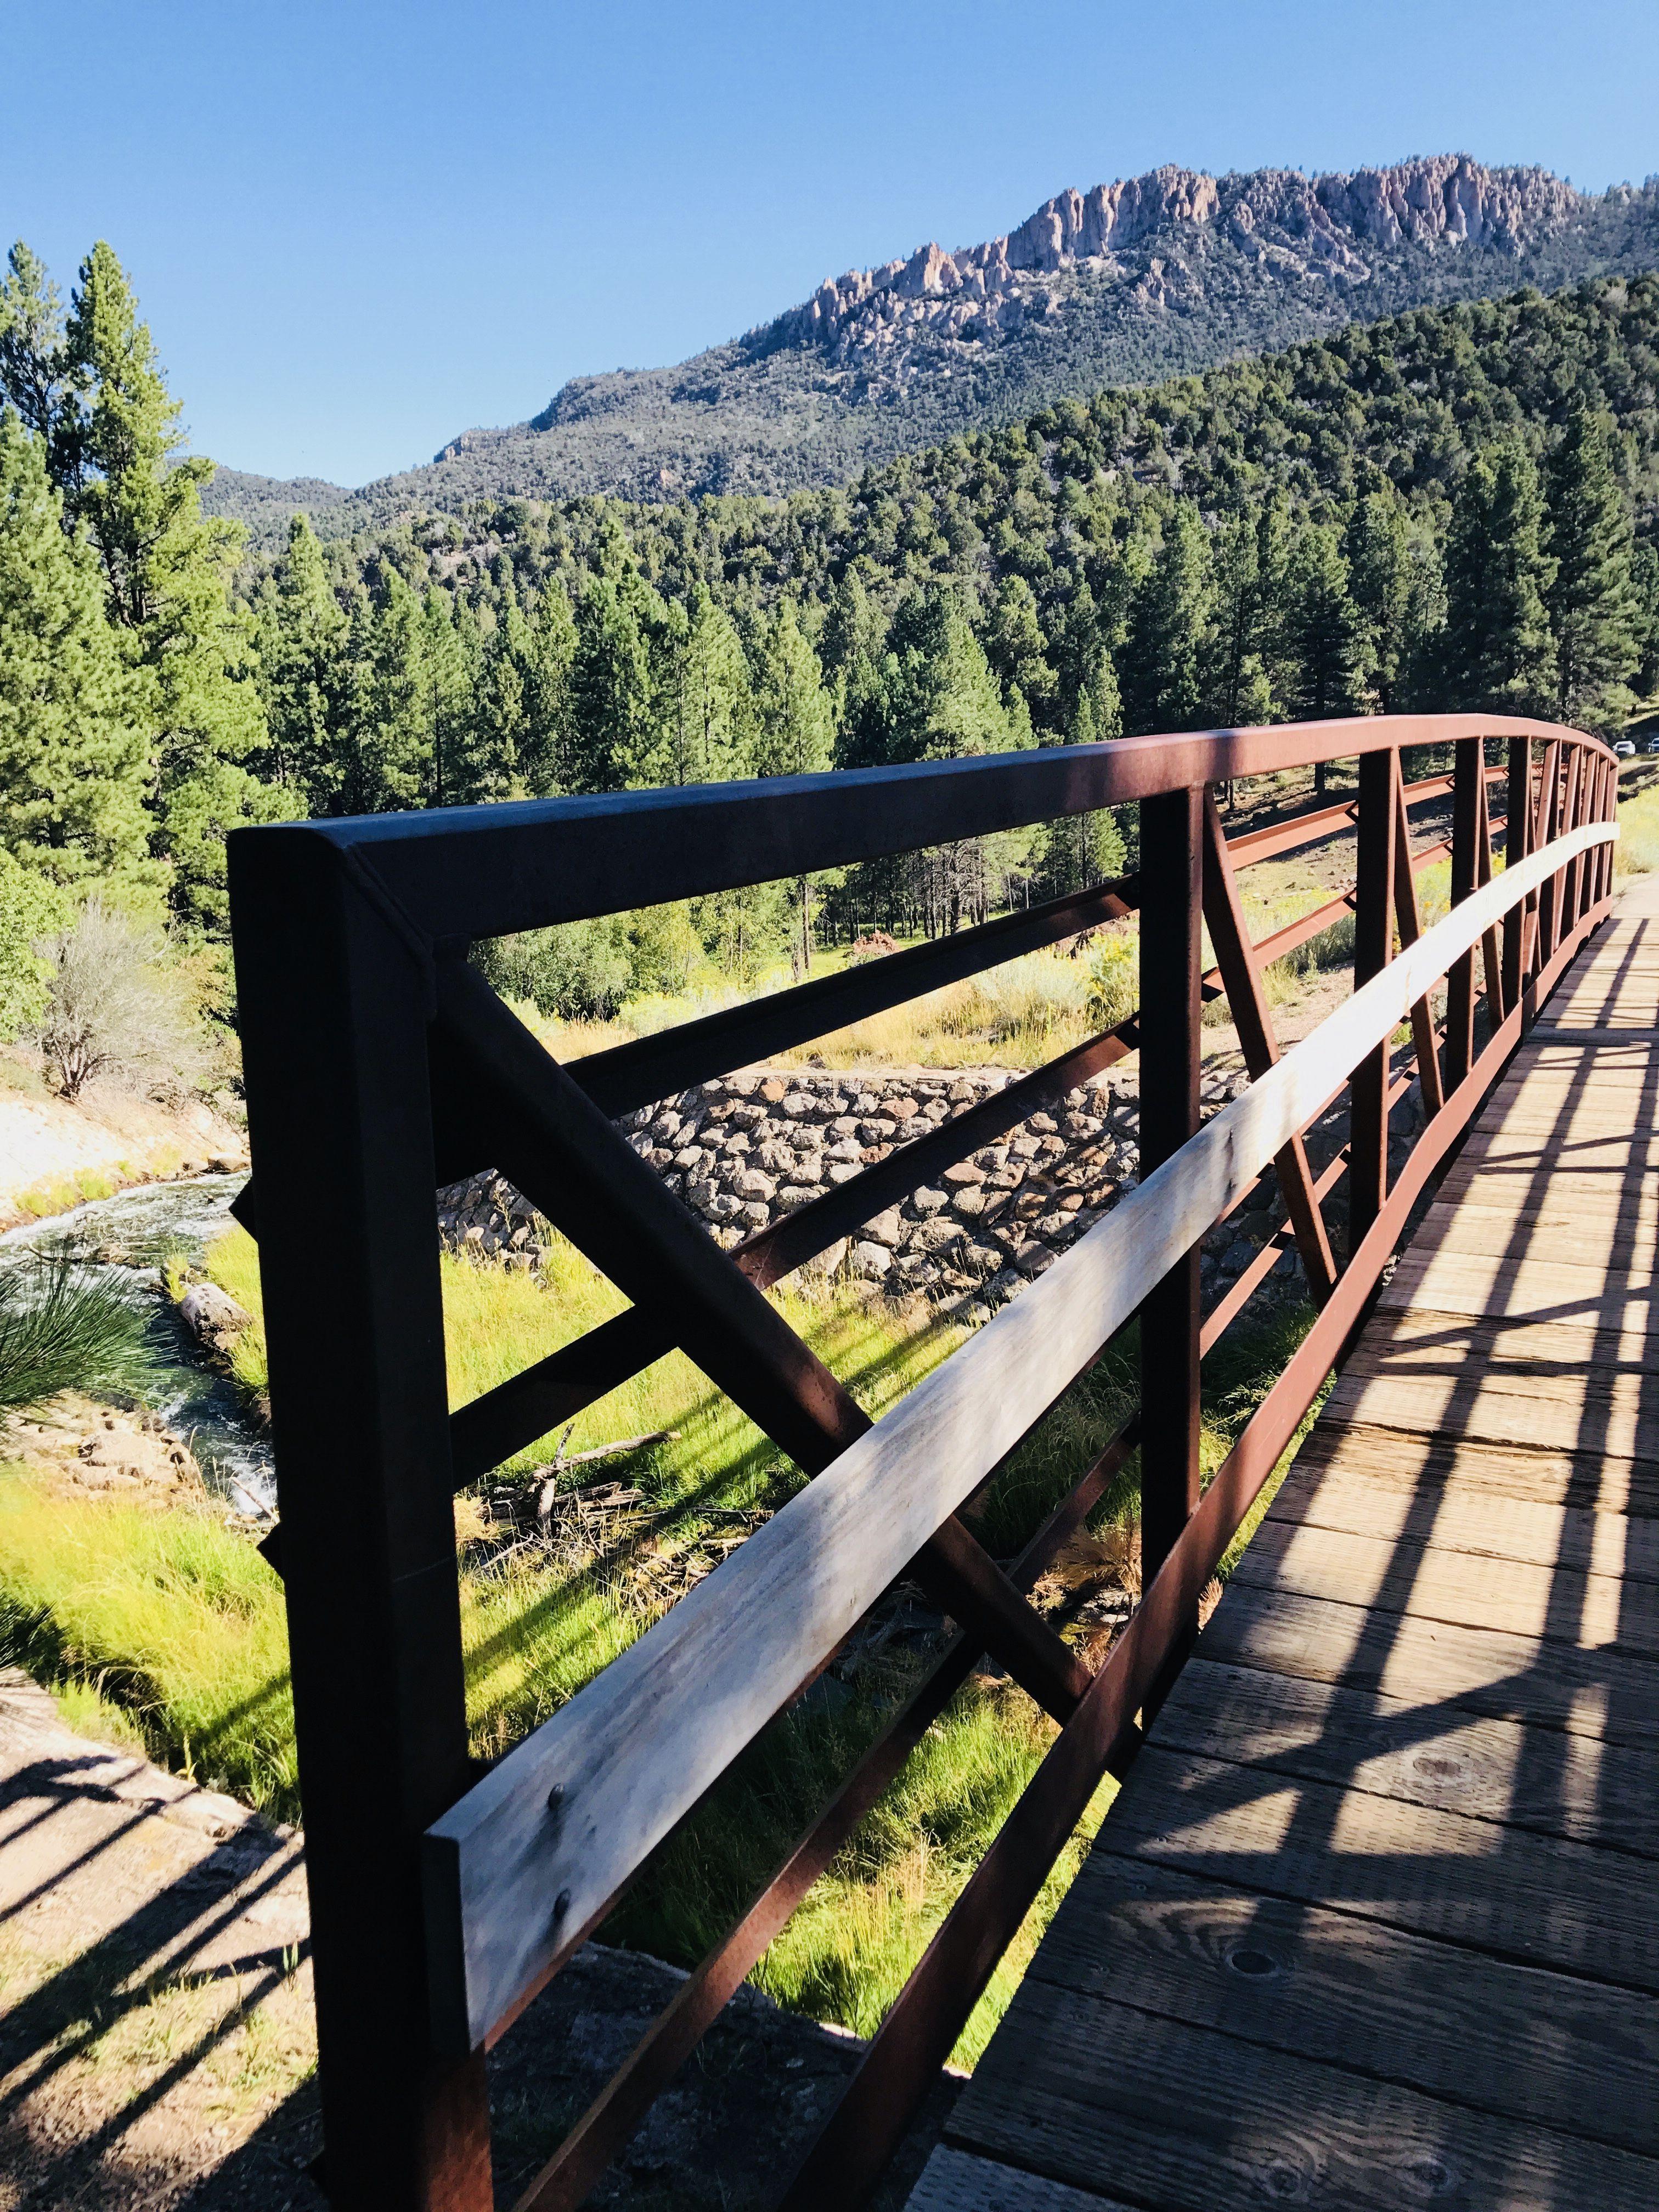 Pine Valley Utah (With images)   Pine valley utah, Outdoor ...